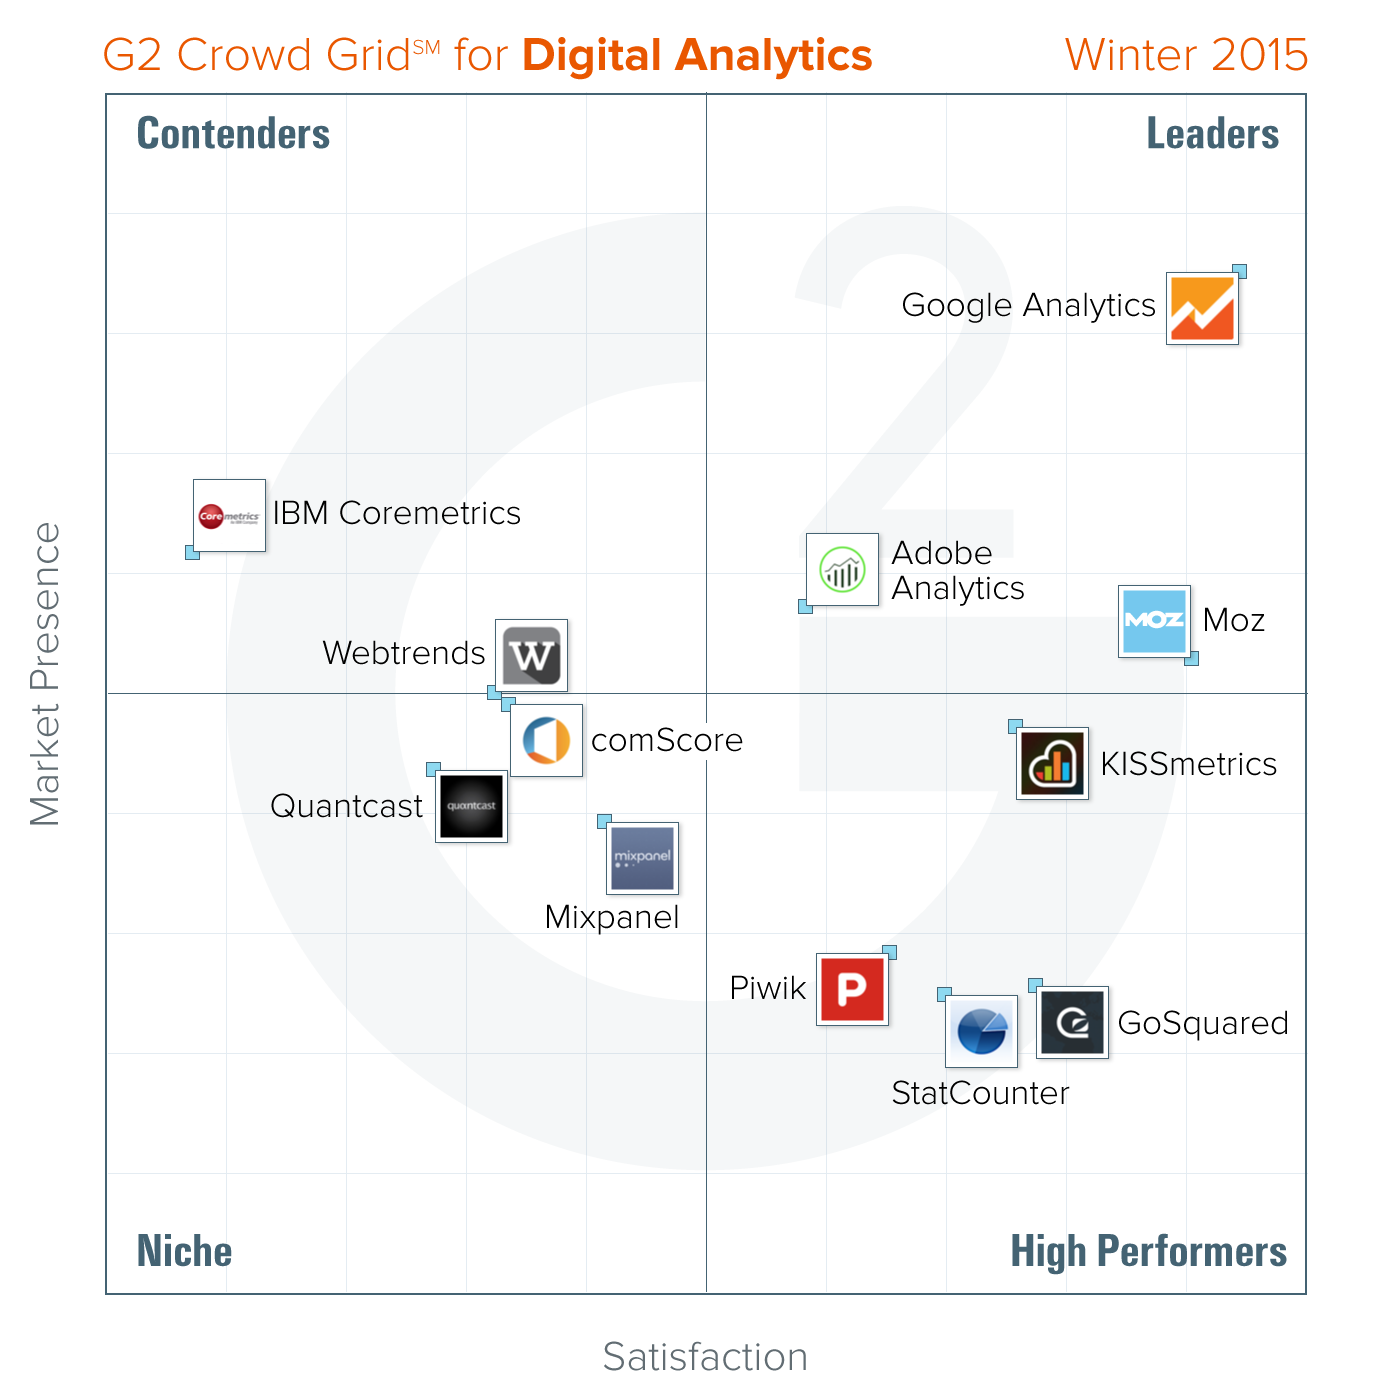 G2 Crowd Publishes Winter 2015 Rankings of the Best Digital Analytics Platforms   Online ...